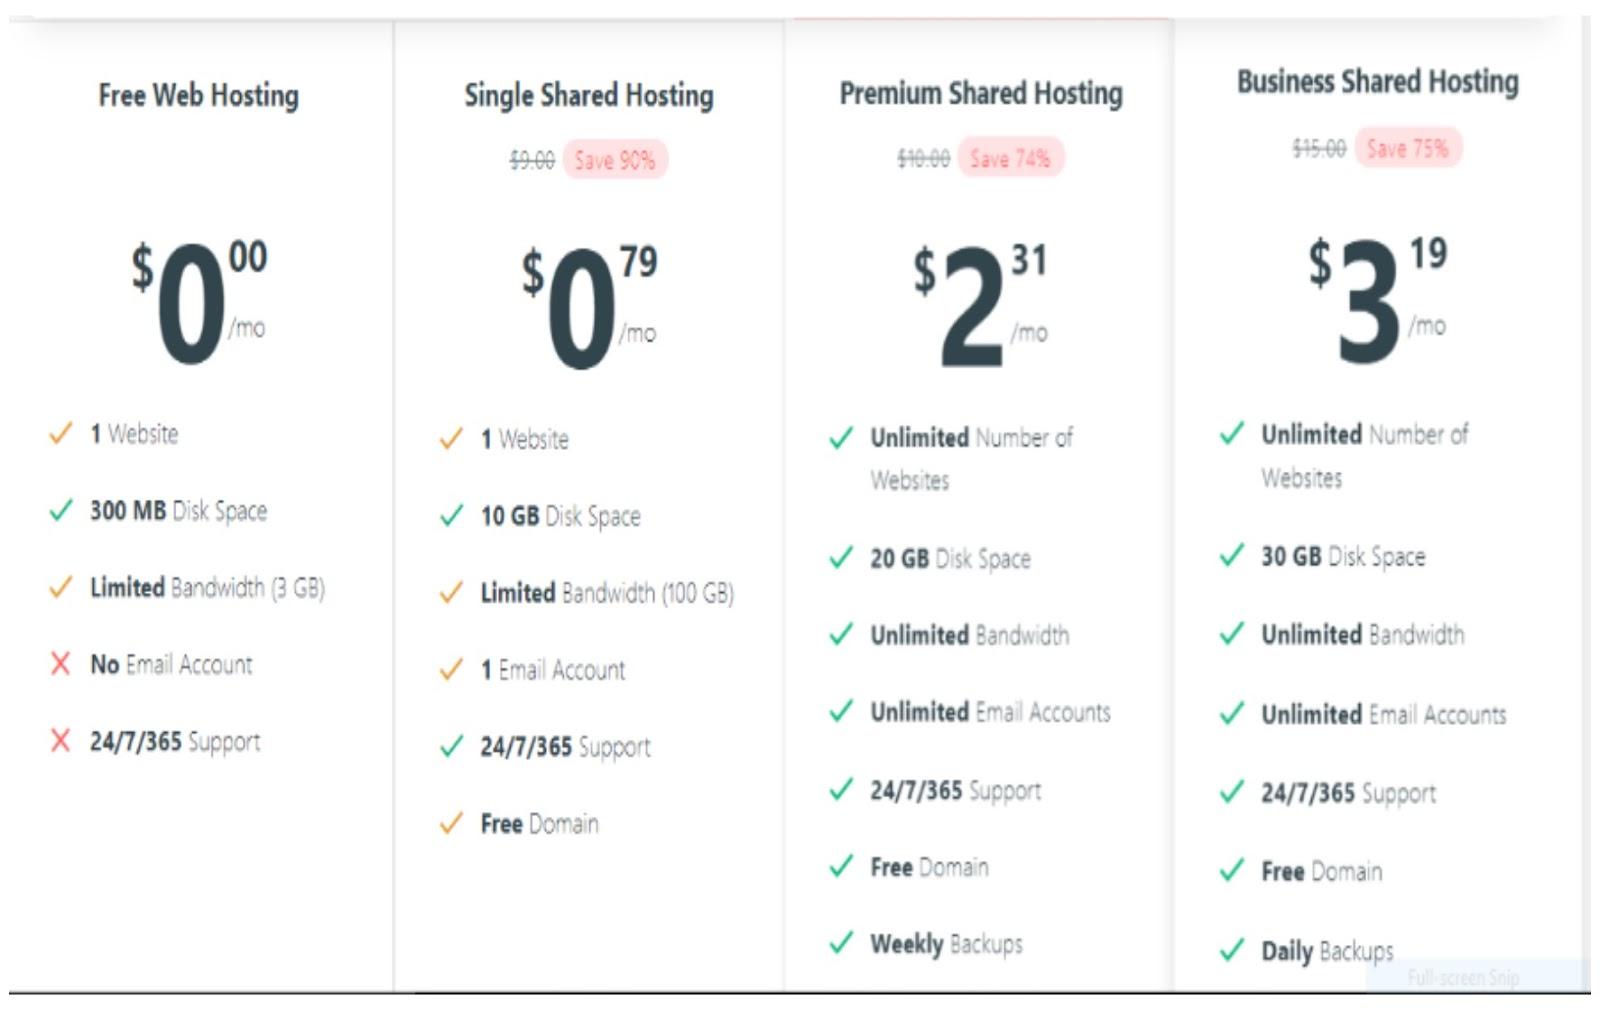 000Webhost Premium Hosting Plan